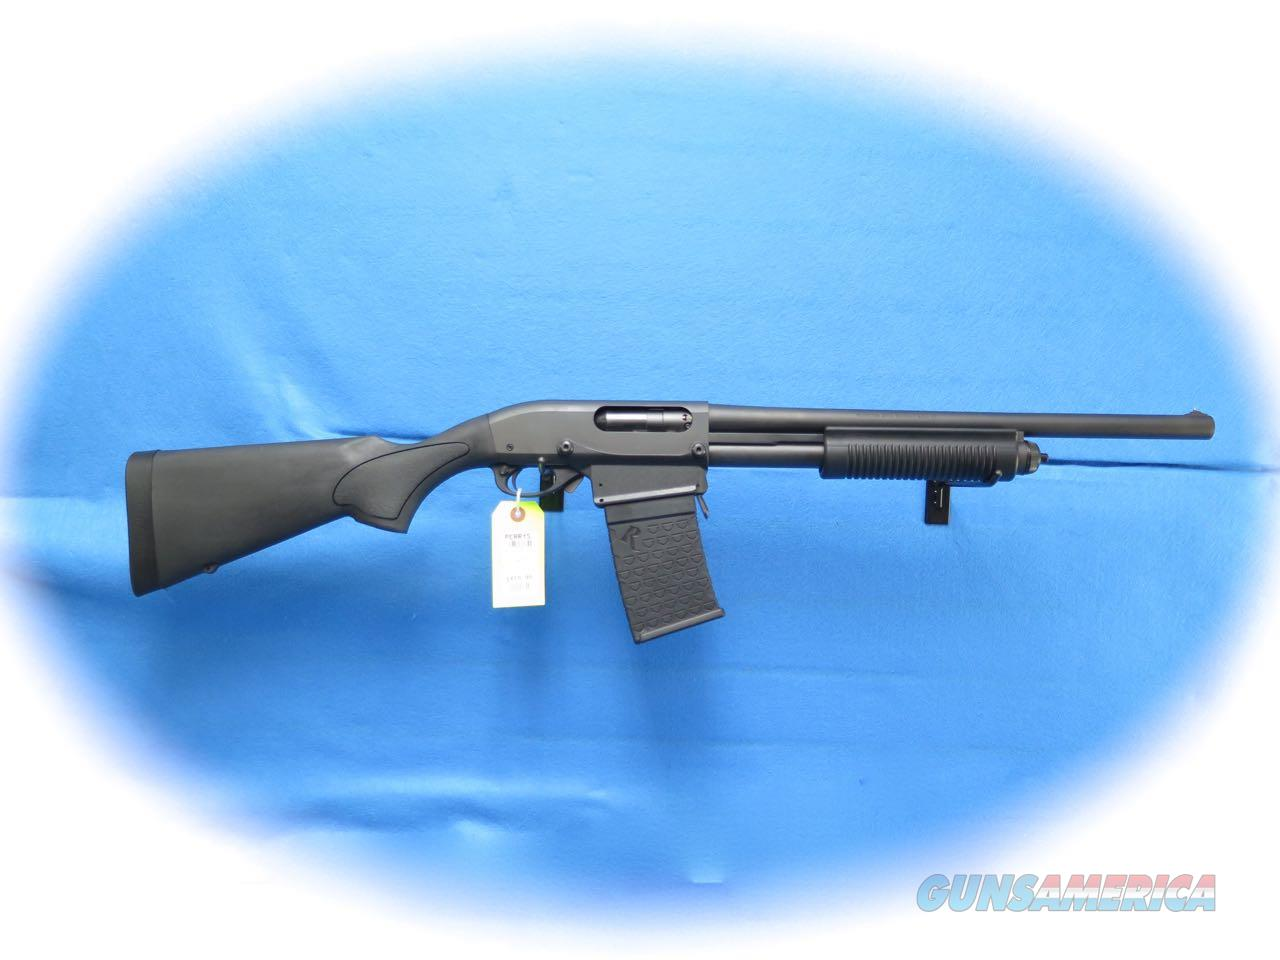 Remington 870 DM Pump 12 Ga. Shotgun Model 81350 **New**  Guns > Shotguns > Remington Shotguns  > Pump > Tactical